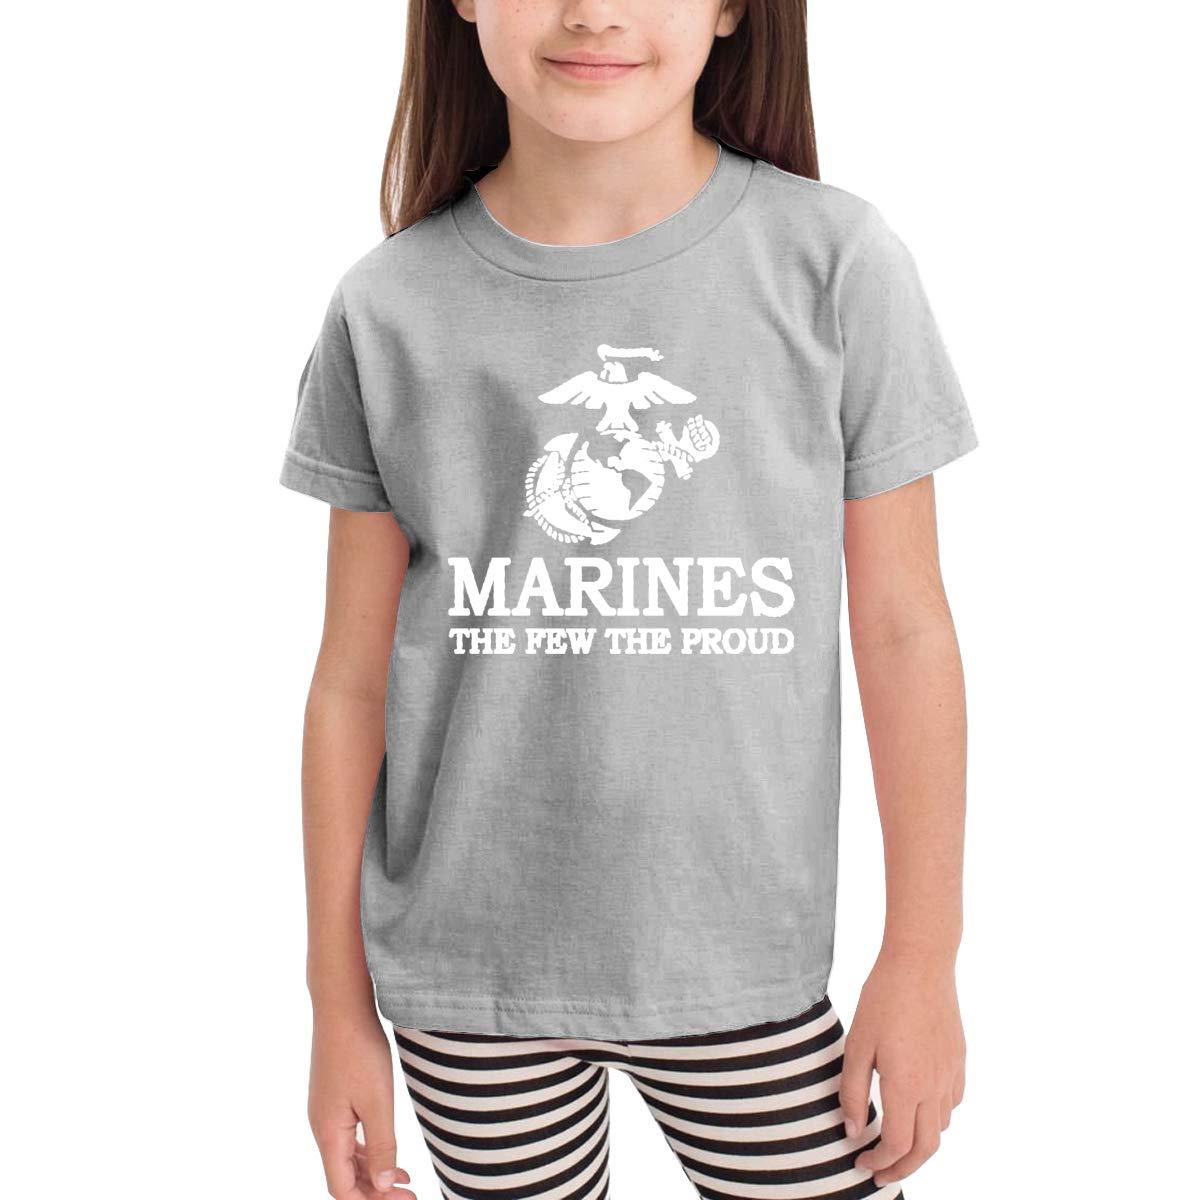 Retro USMC The Few The Proud Marines Logo Unisex Youths Short Sleeve T-Shirt Kids T-Shirt Tops Black